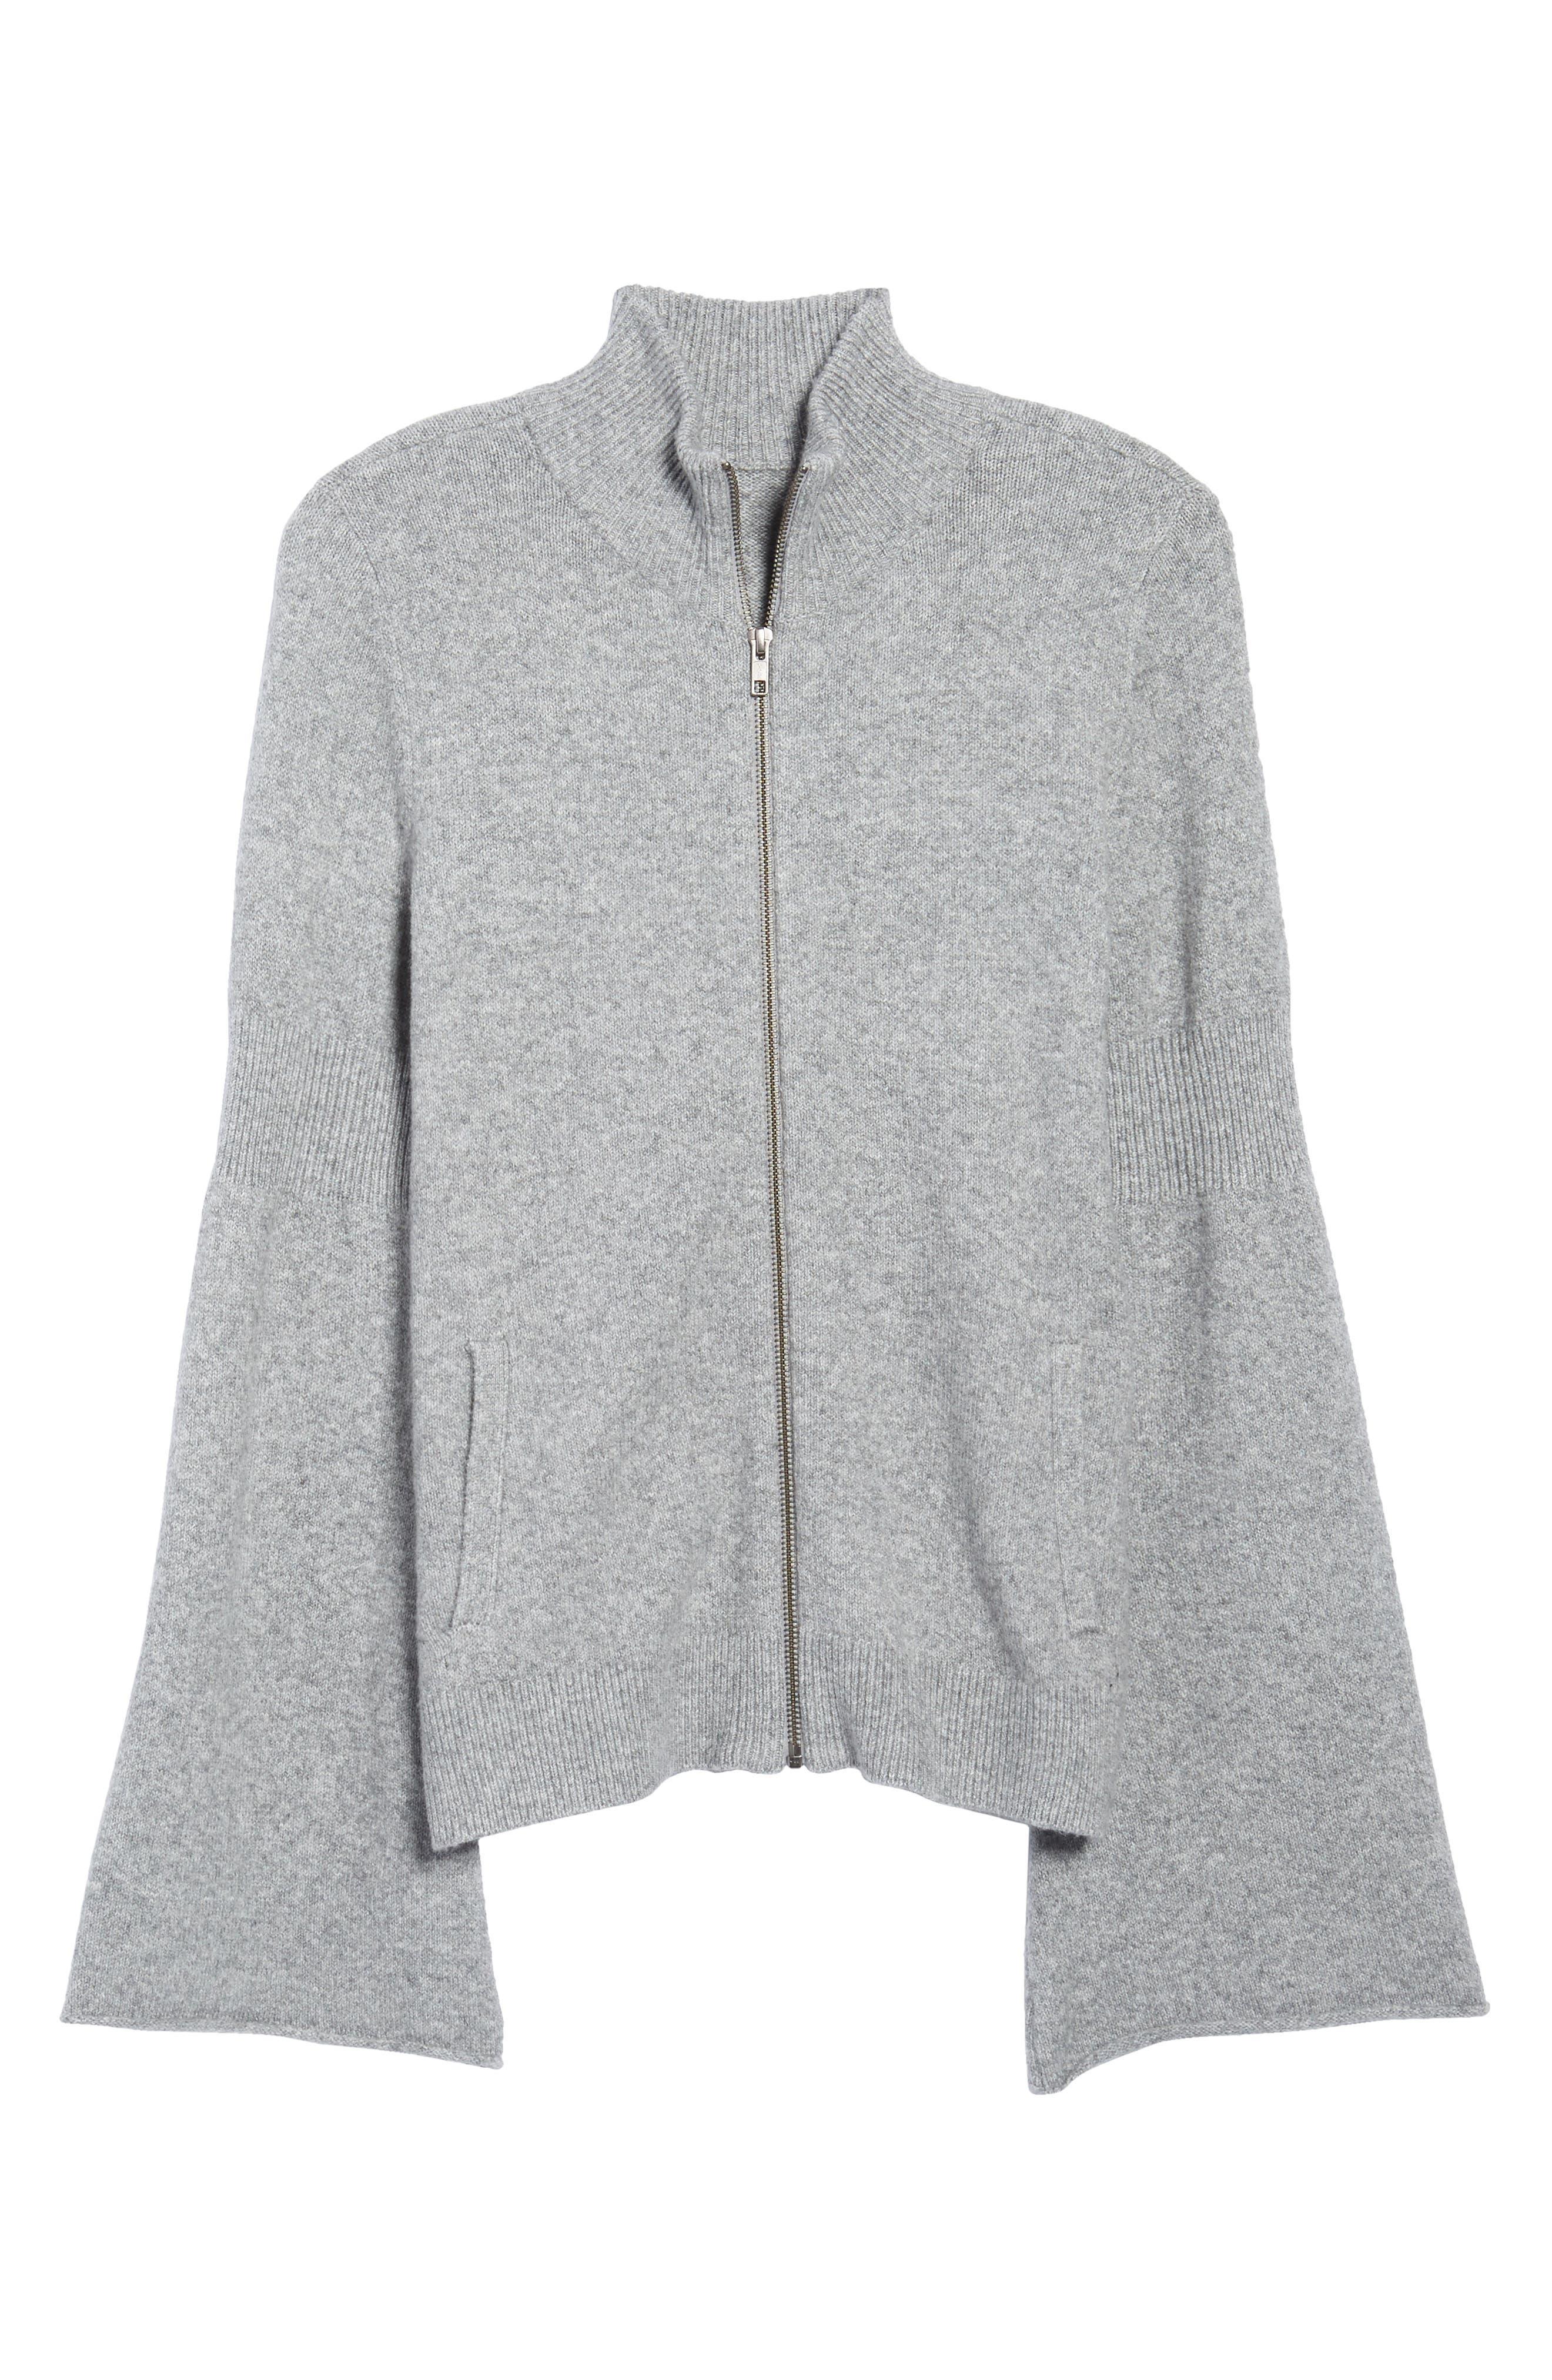 Flare Sleeve Track Jacket,                             Alternate thumbnail 6, color,                             Grey Heather